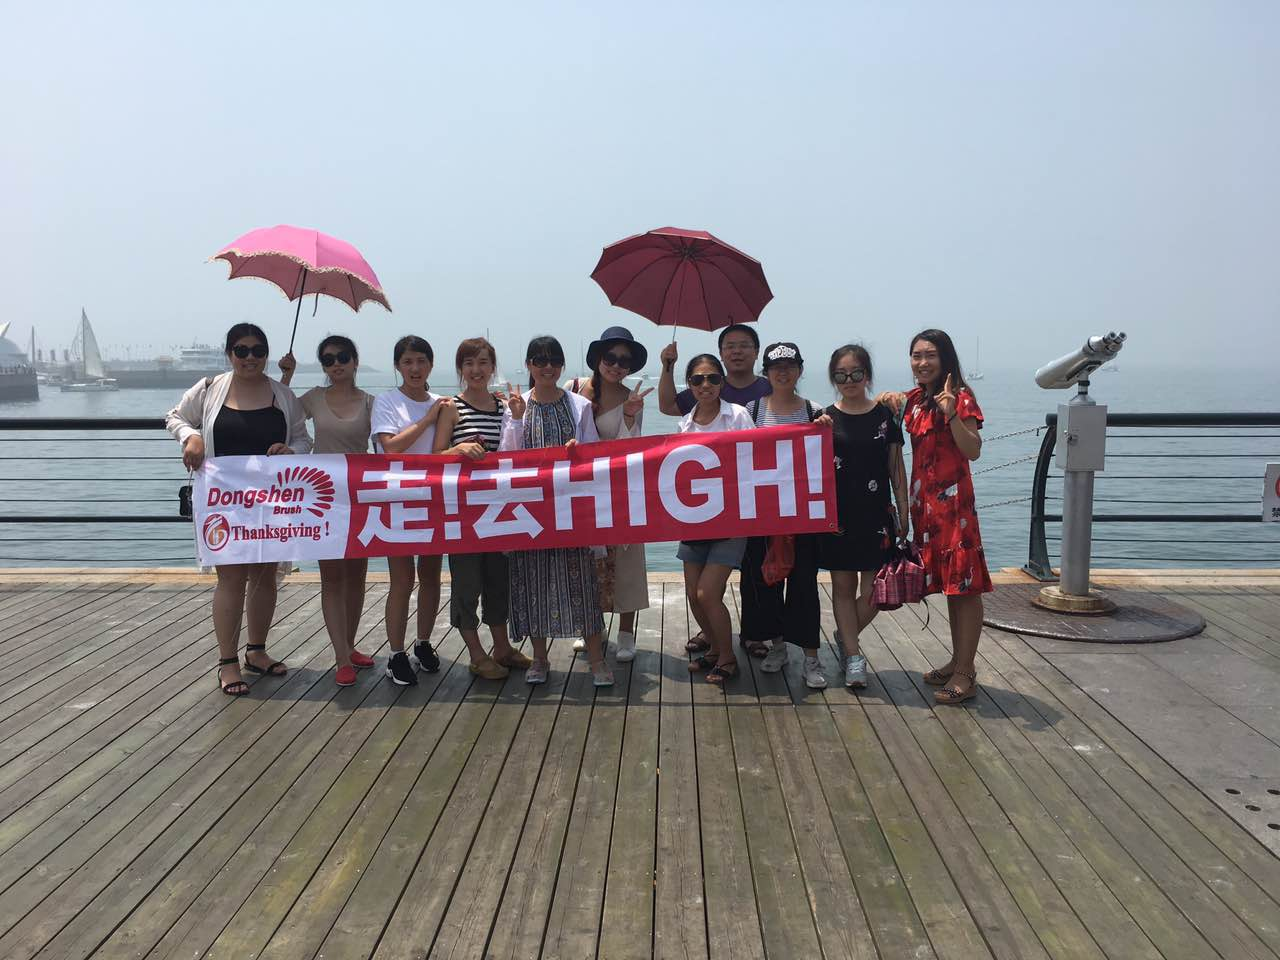 We went to the beautiful seaside city of Qingdao, China